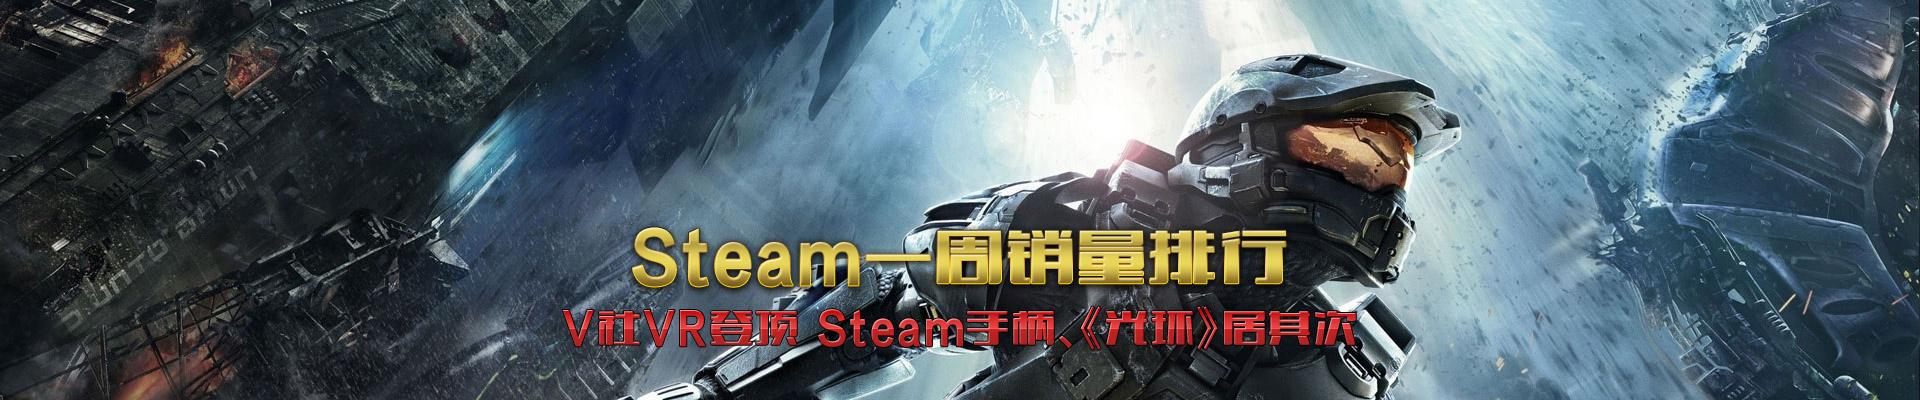 Steam周销量排行榜:V社VR登顶 Steam手柄、《光环》居其次